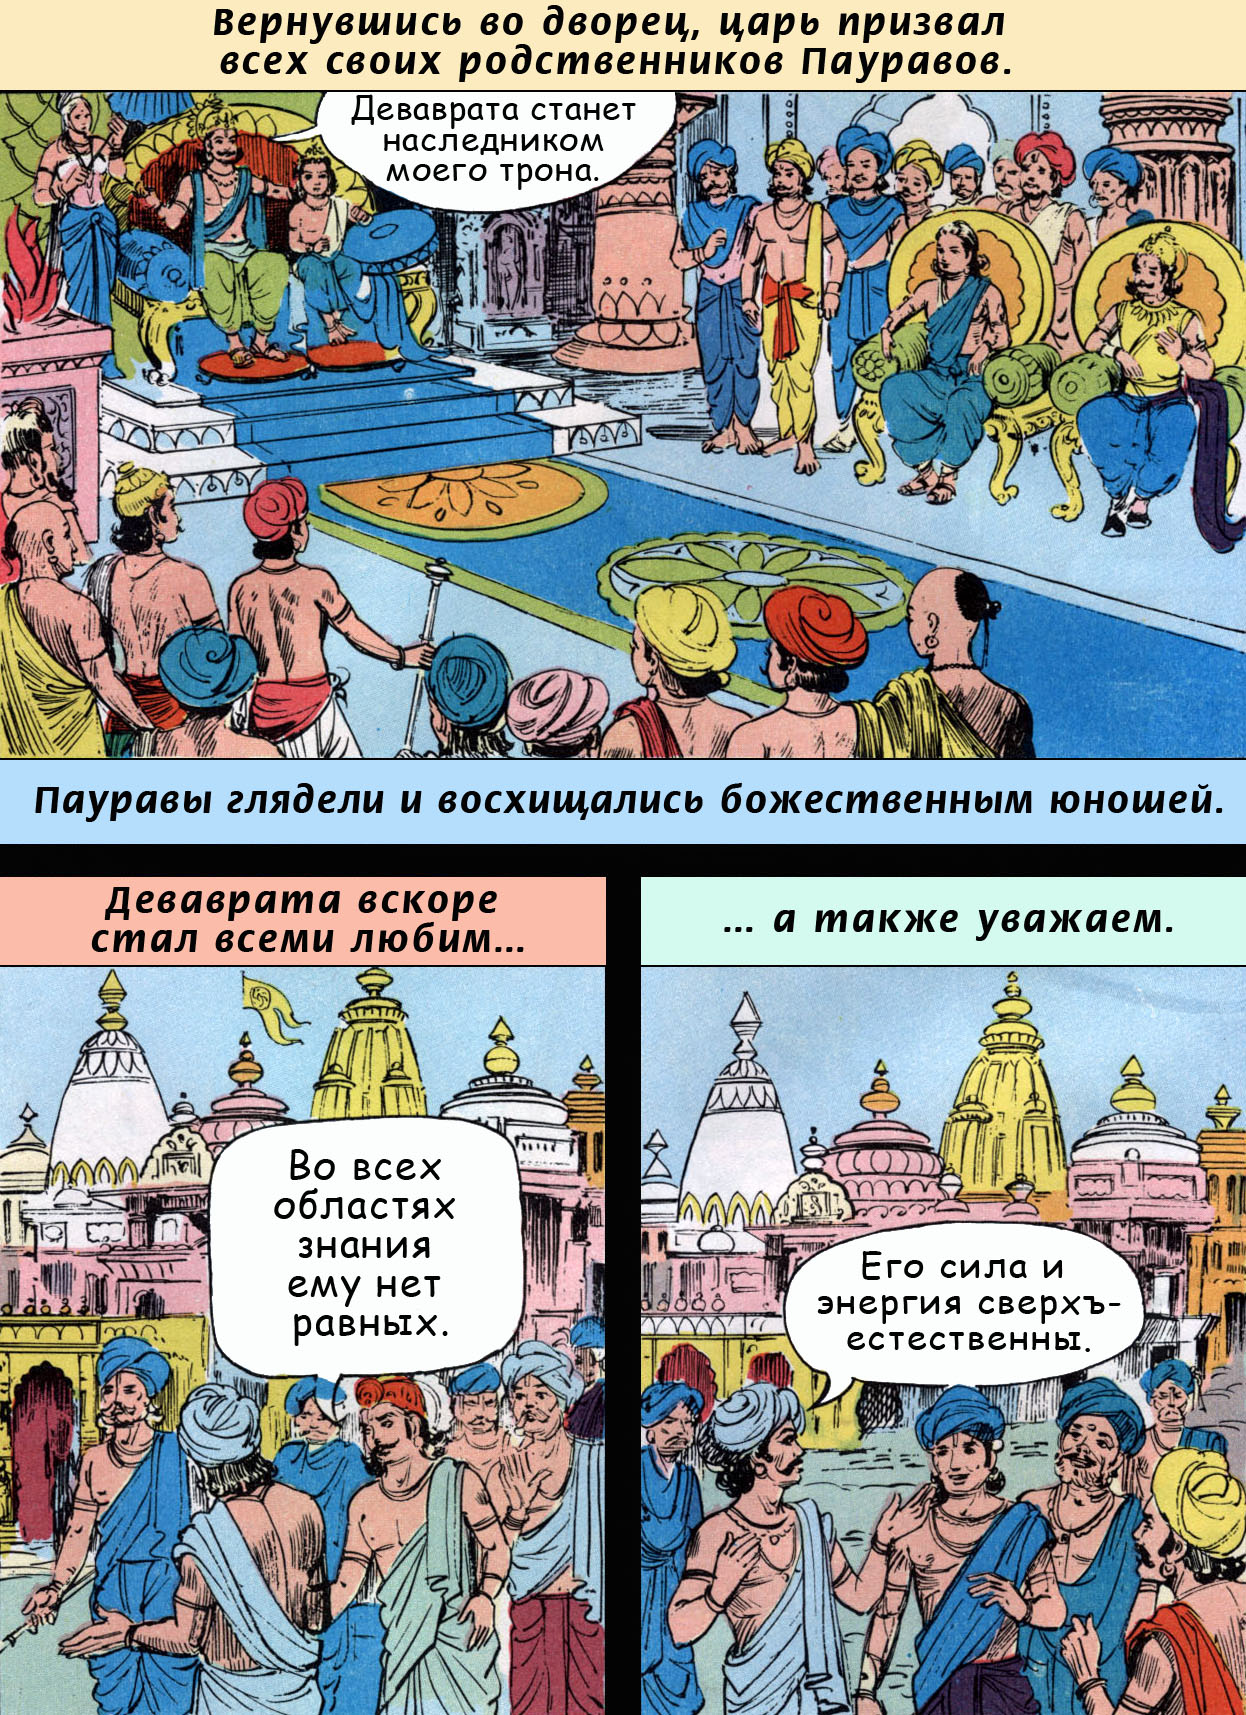 Бхишма 10 - ведический комикс